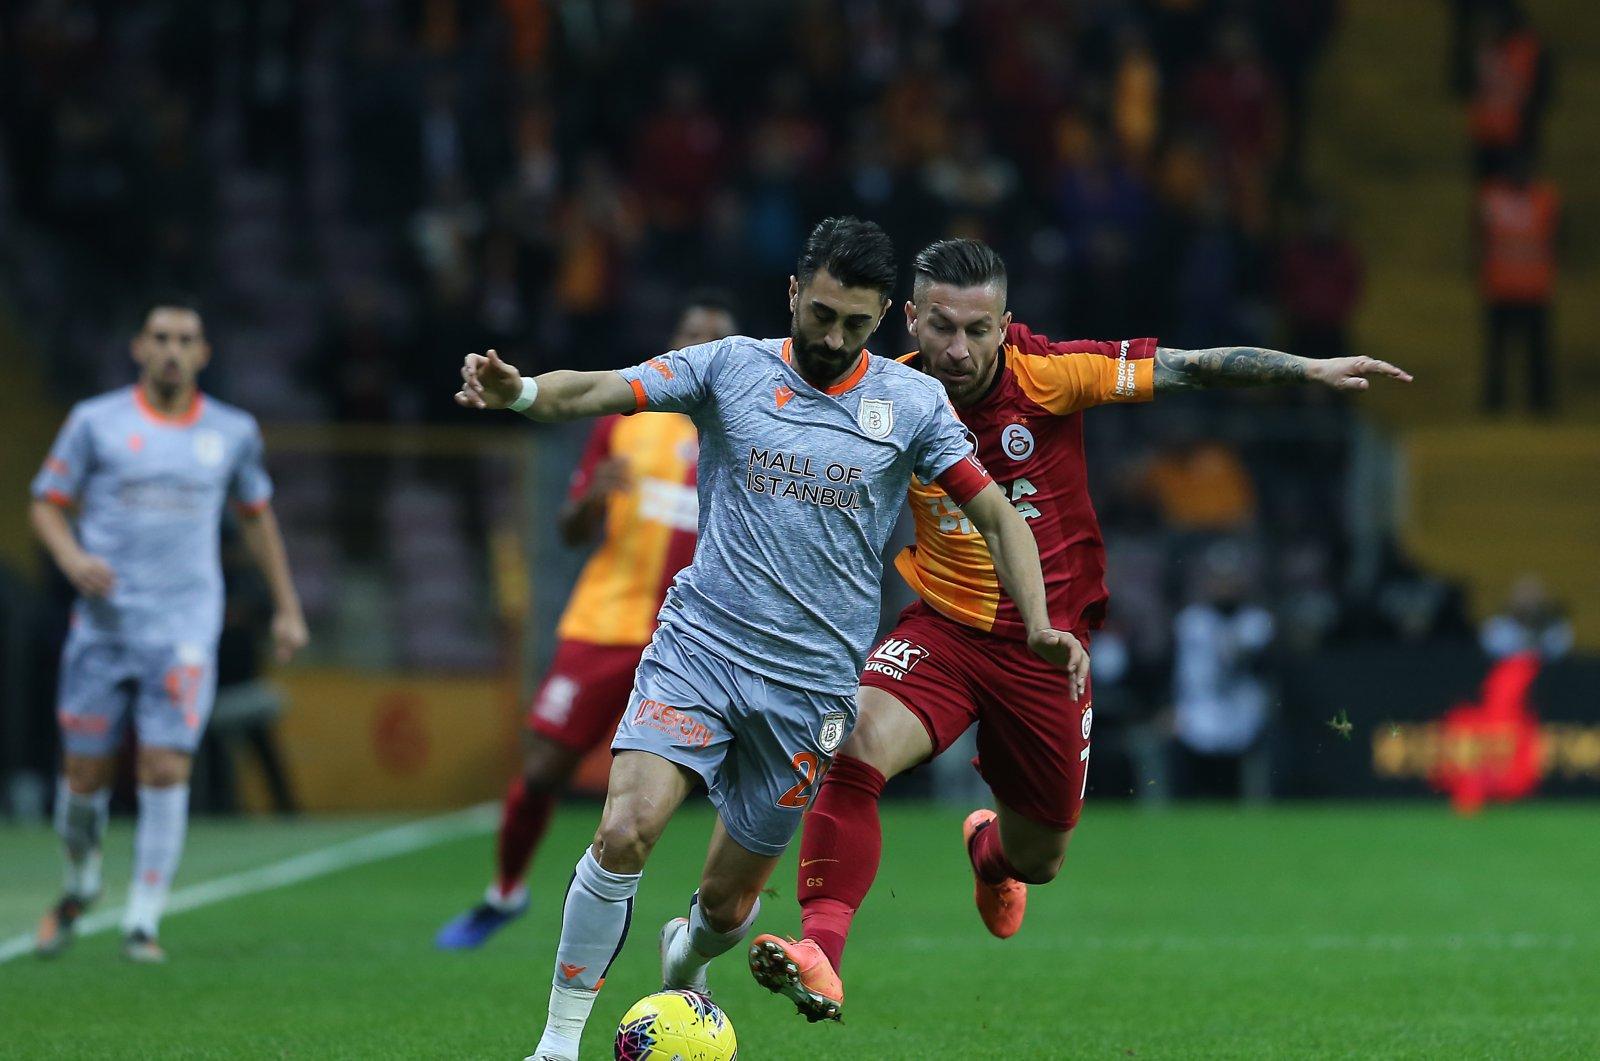 Başakşehir's Mahmut Tekdemir and Galatasaray's Adem Büyük vie for the ball during a Süper Lig match in Istanbul, Turkey, Nov. 22, 2019. (AA Photo)